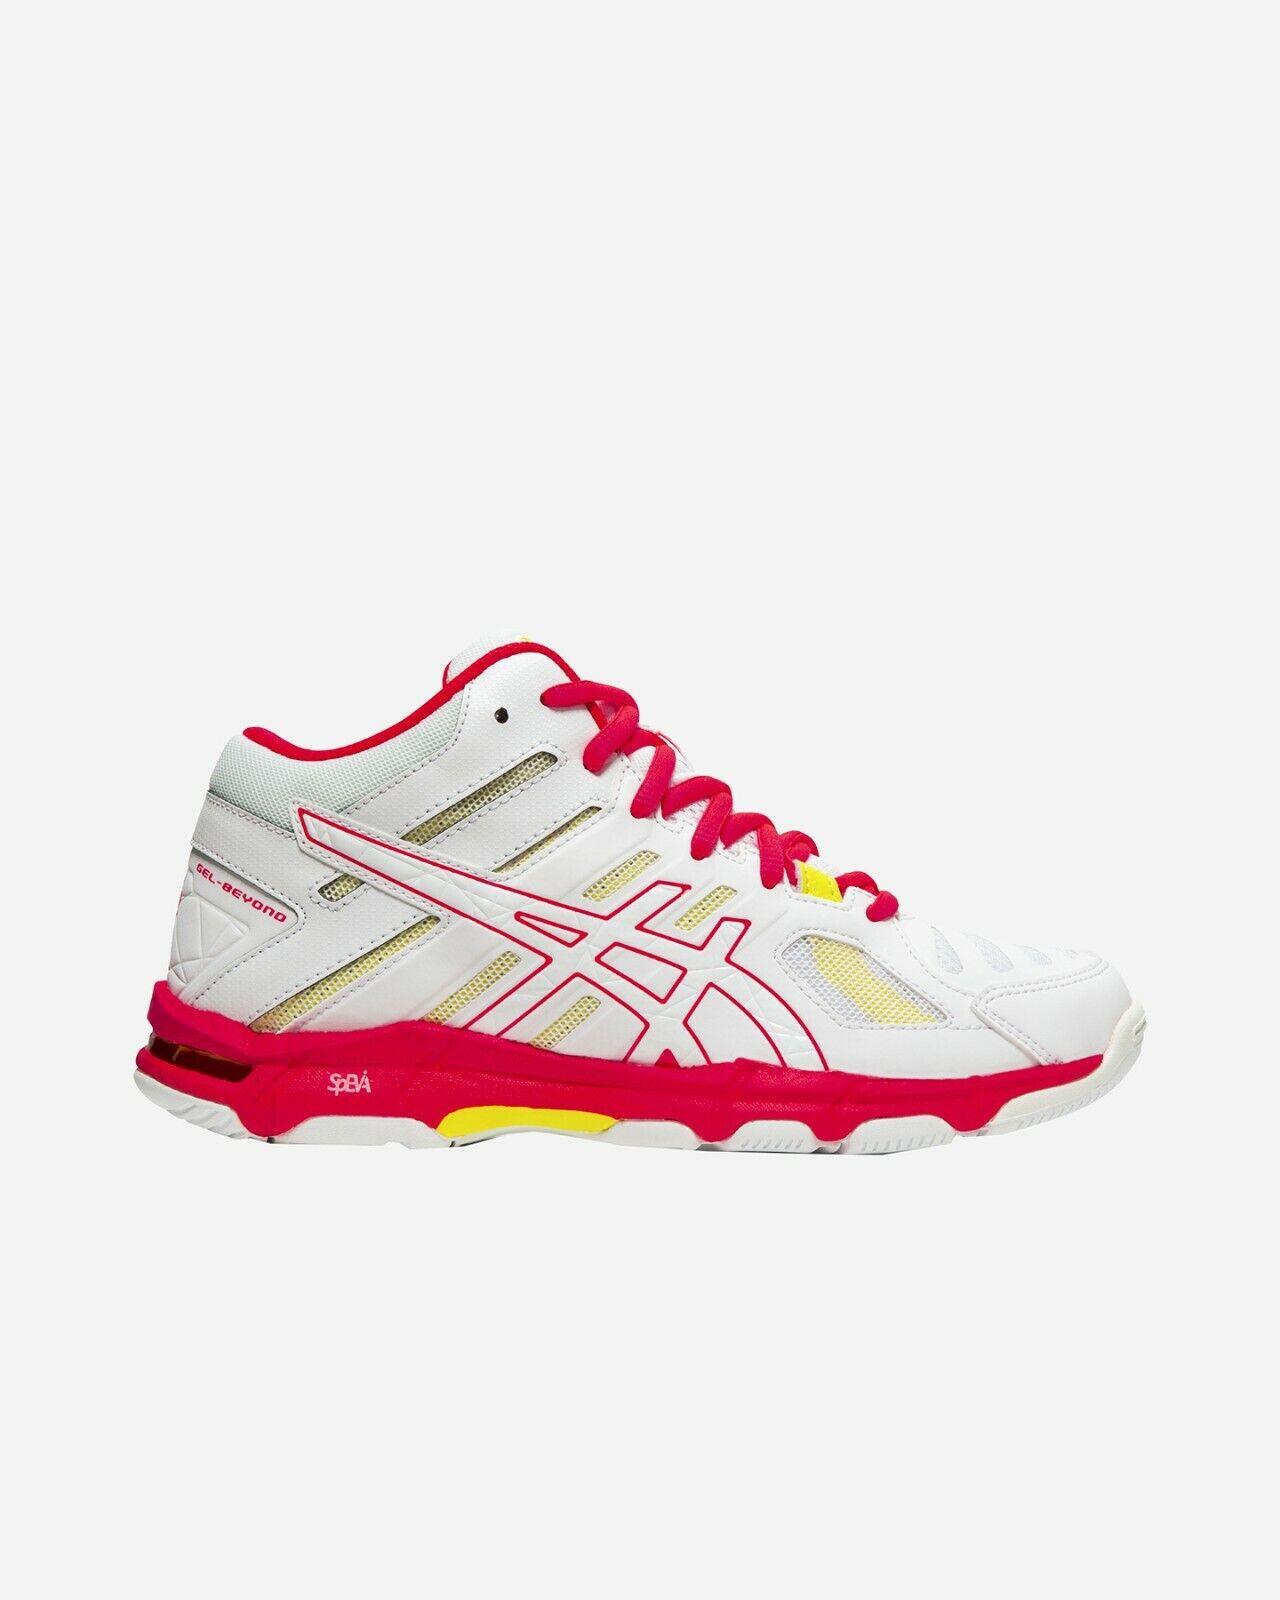 Scarpe pallavolo ASICS GEL BEYOND 5 MT B650N 100 volley donna scarpa woman